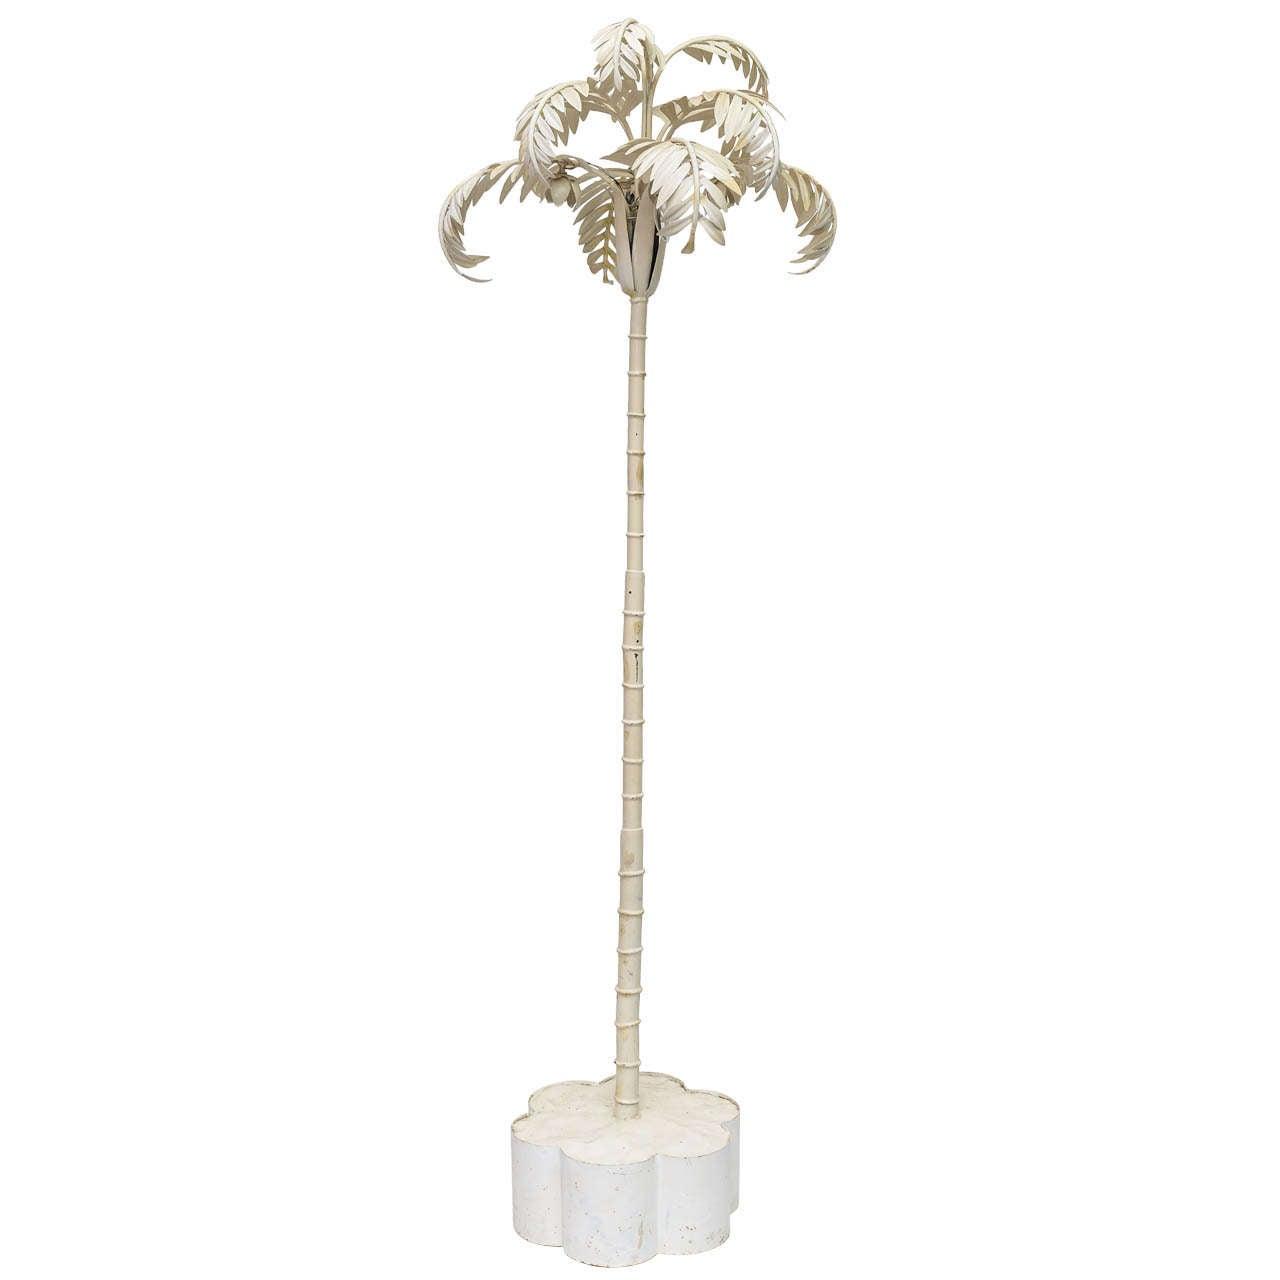 60 39 s palm tree floor lamp at 1stdibs. Black Bedroom Furniture Sets. Home Design Ideas